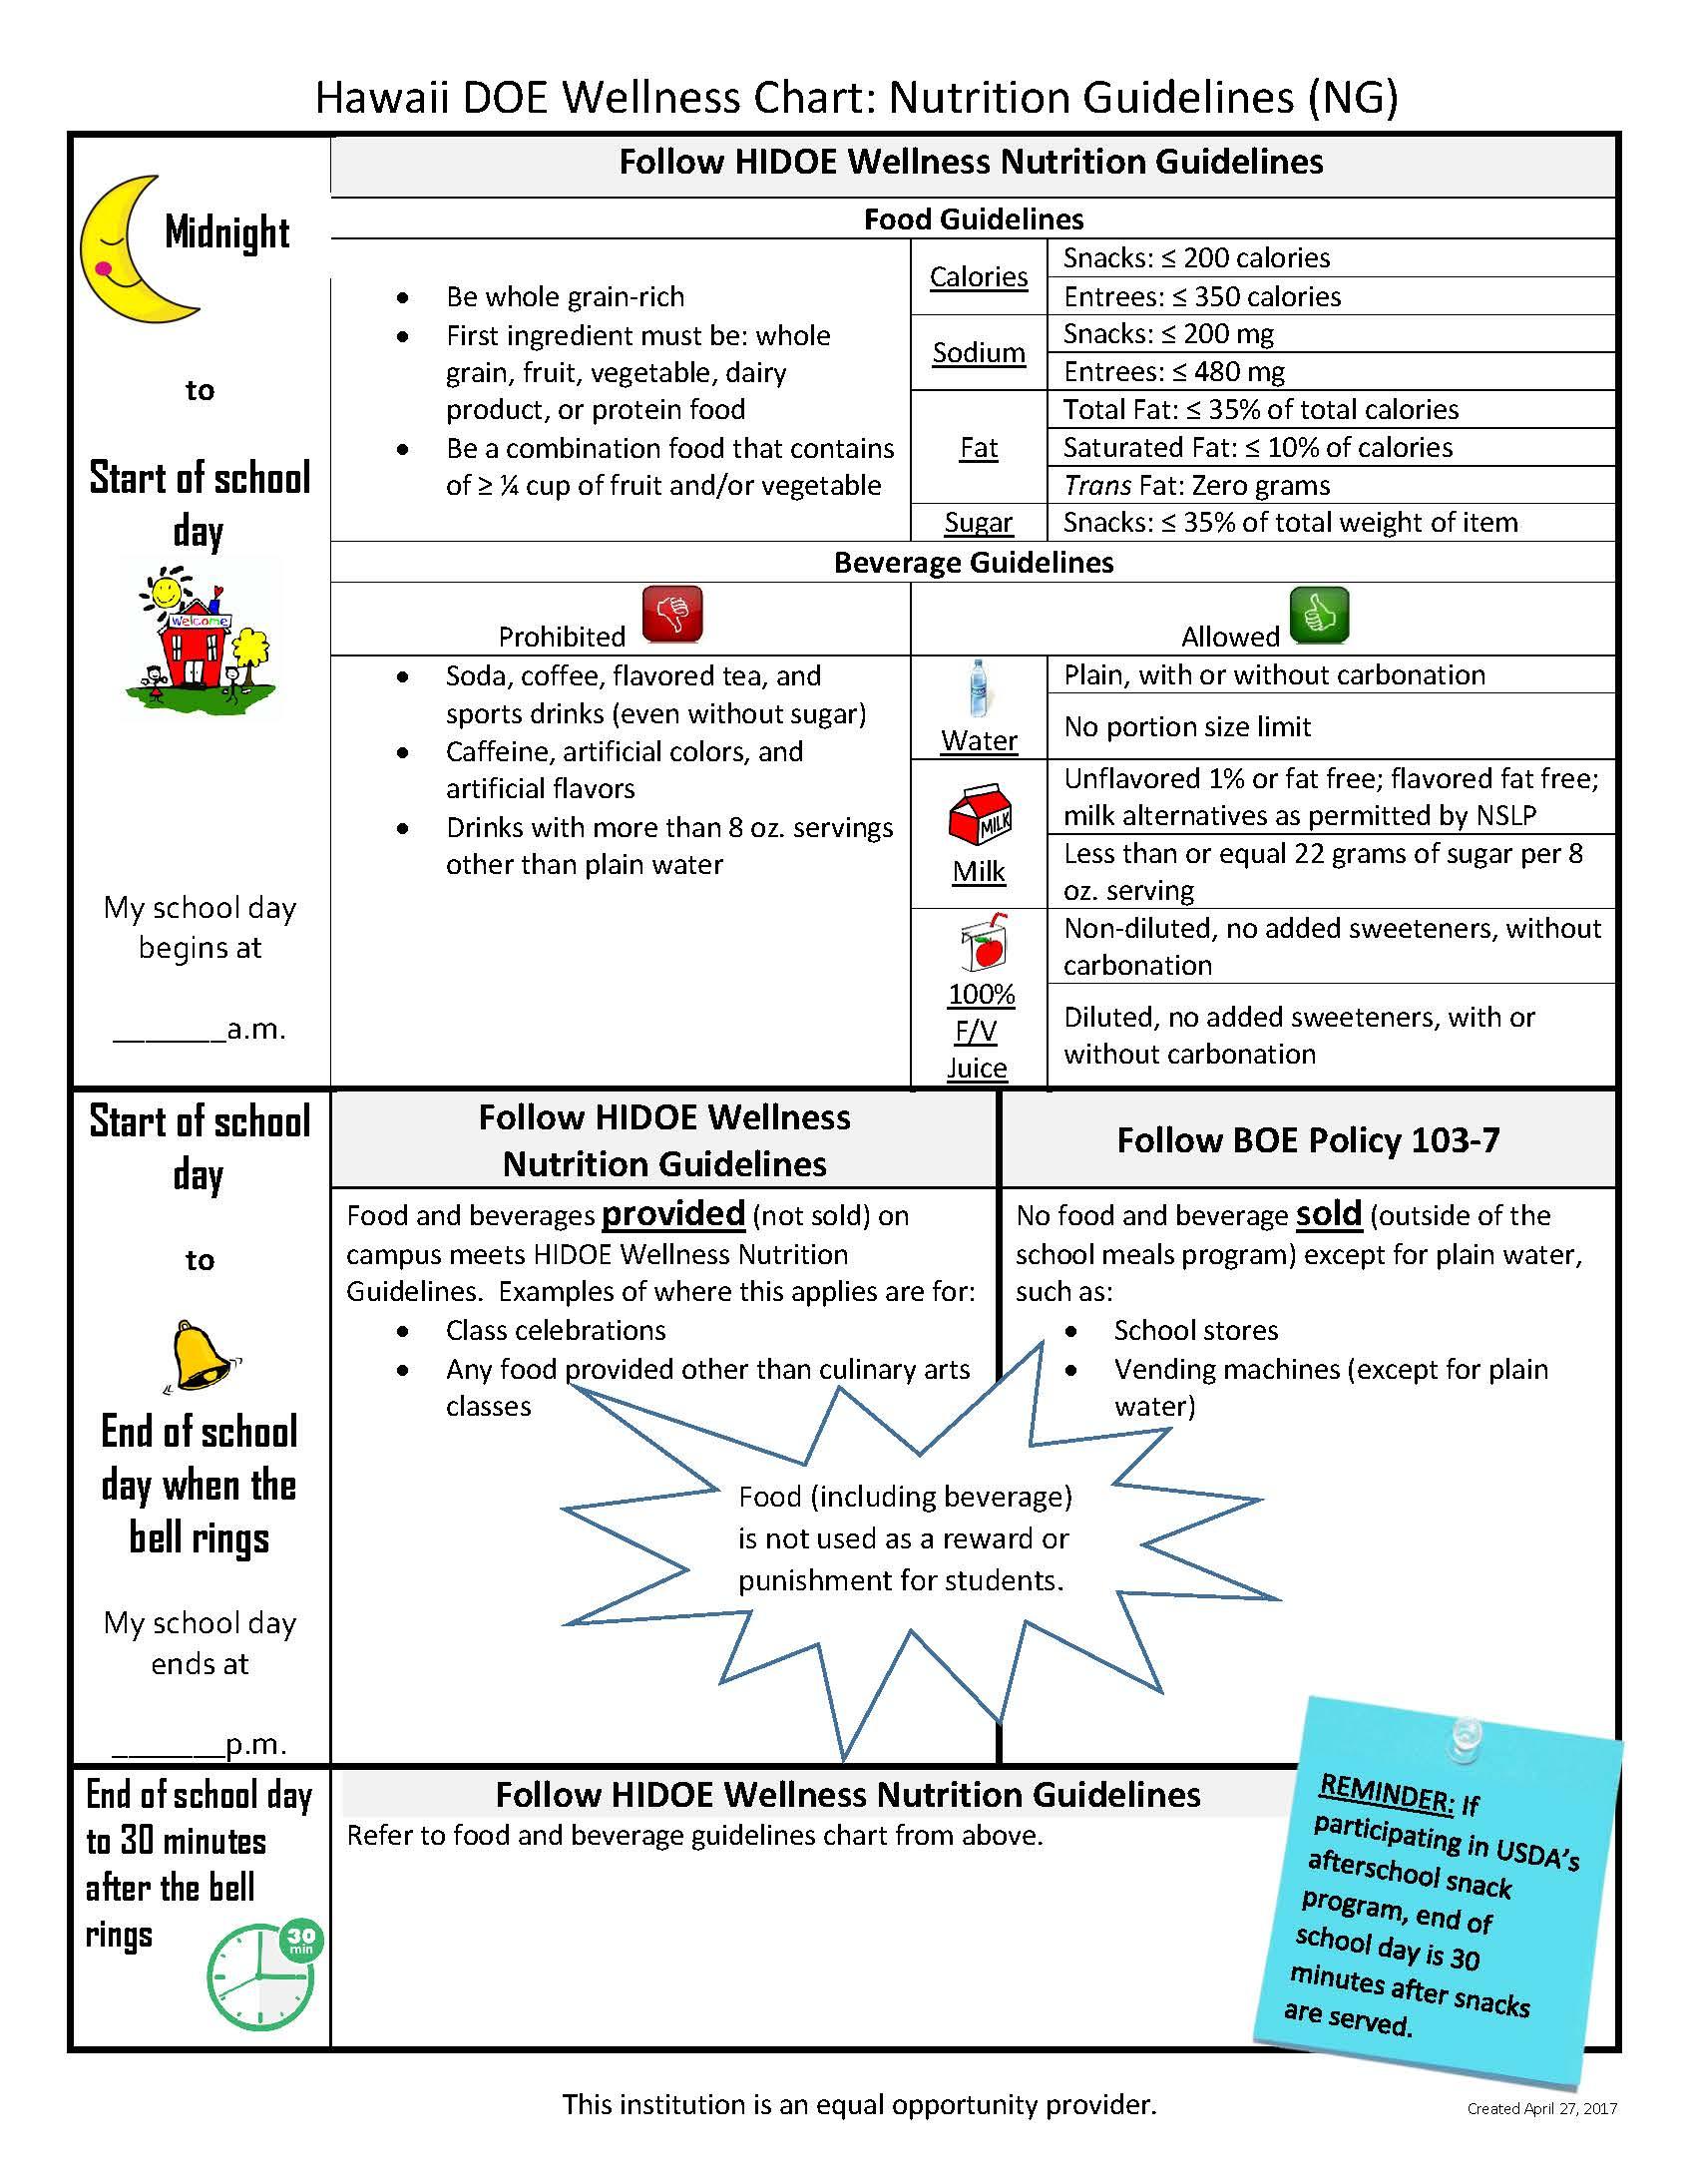 Hawaii Doe   Nutrition Guidelines For Food, Beverages Pertaining To Doe State Of Hawaii School Calendar